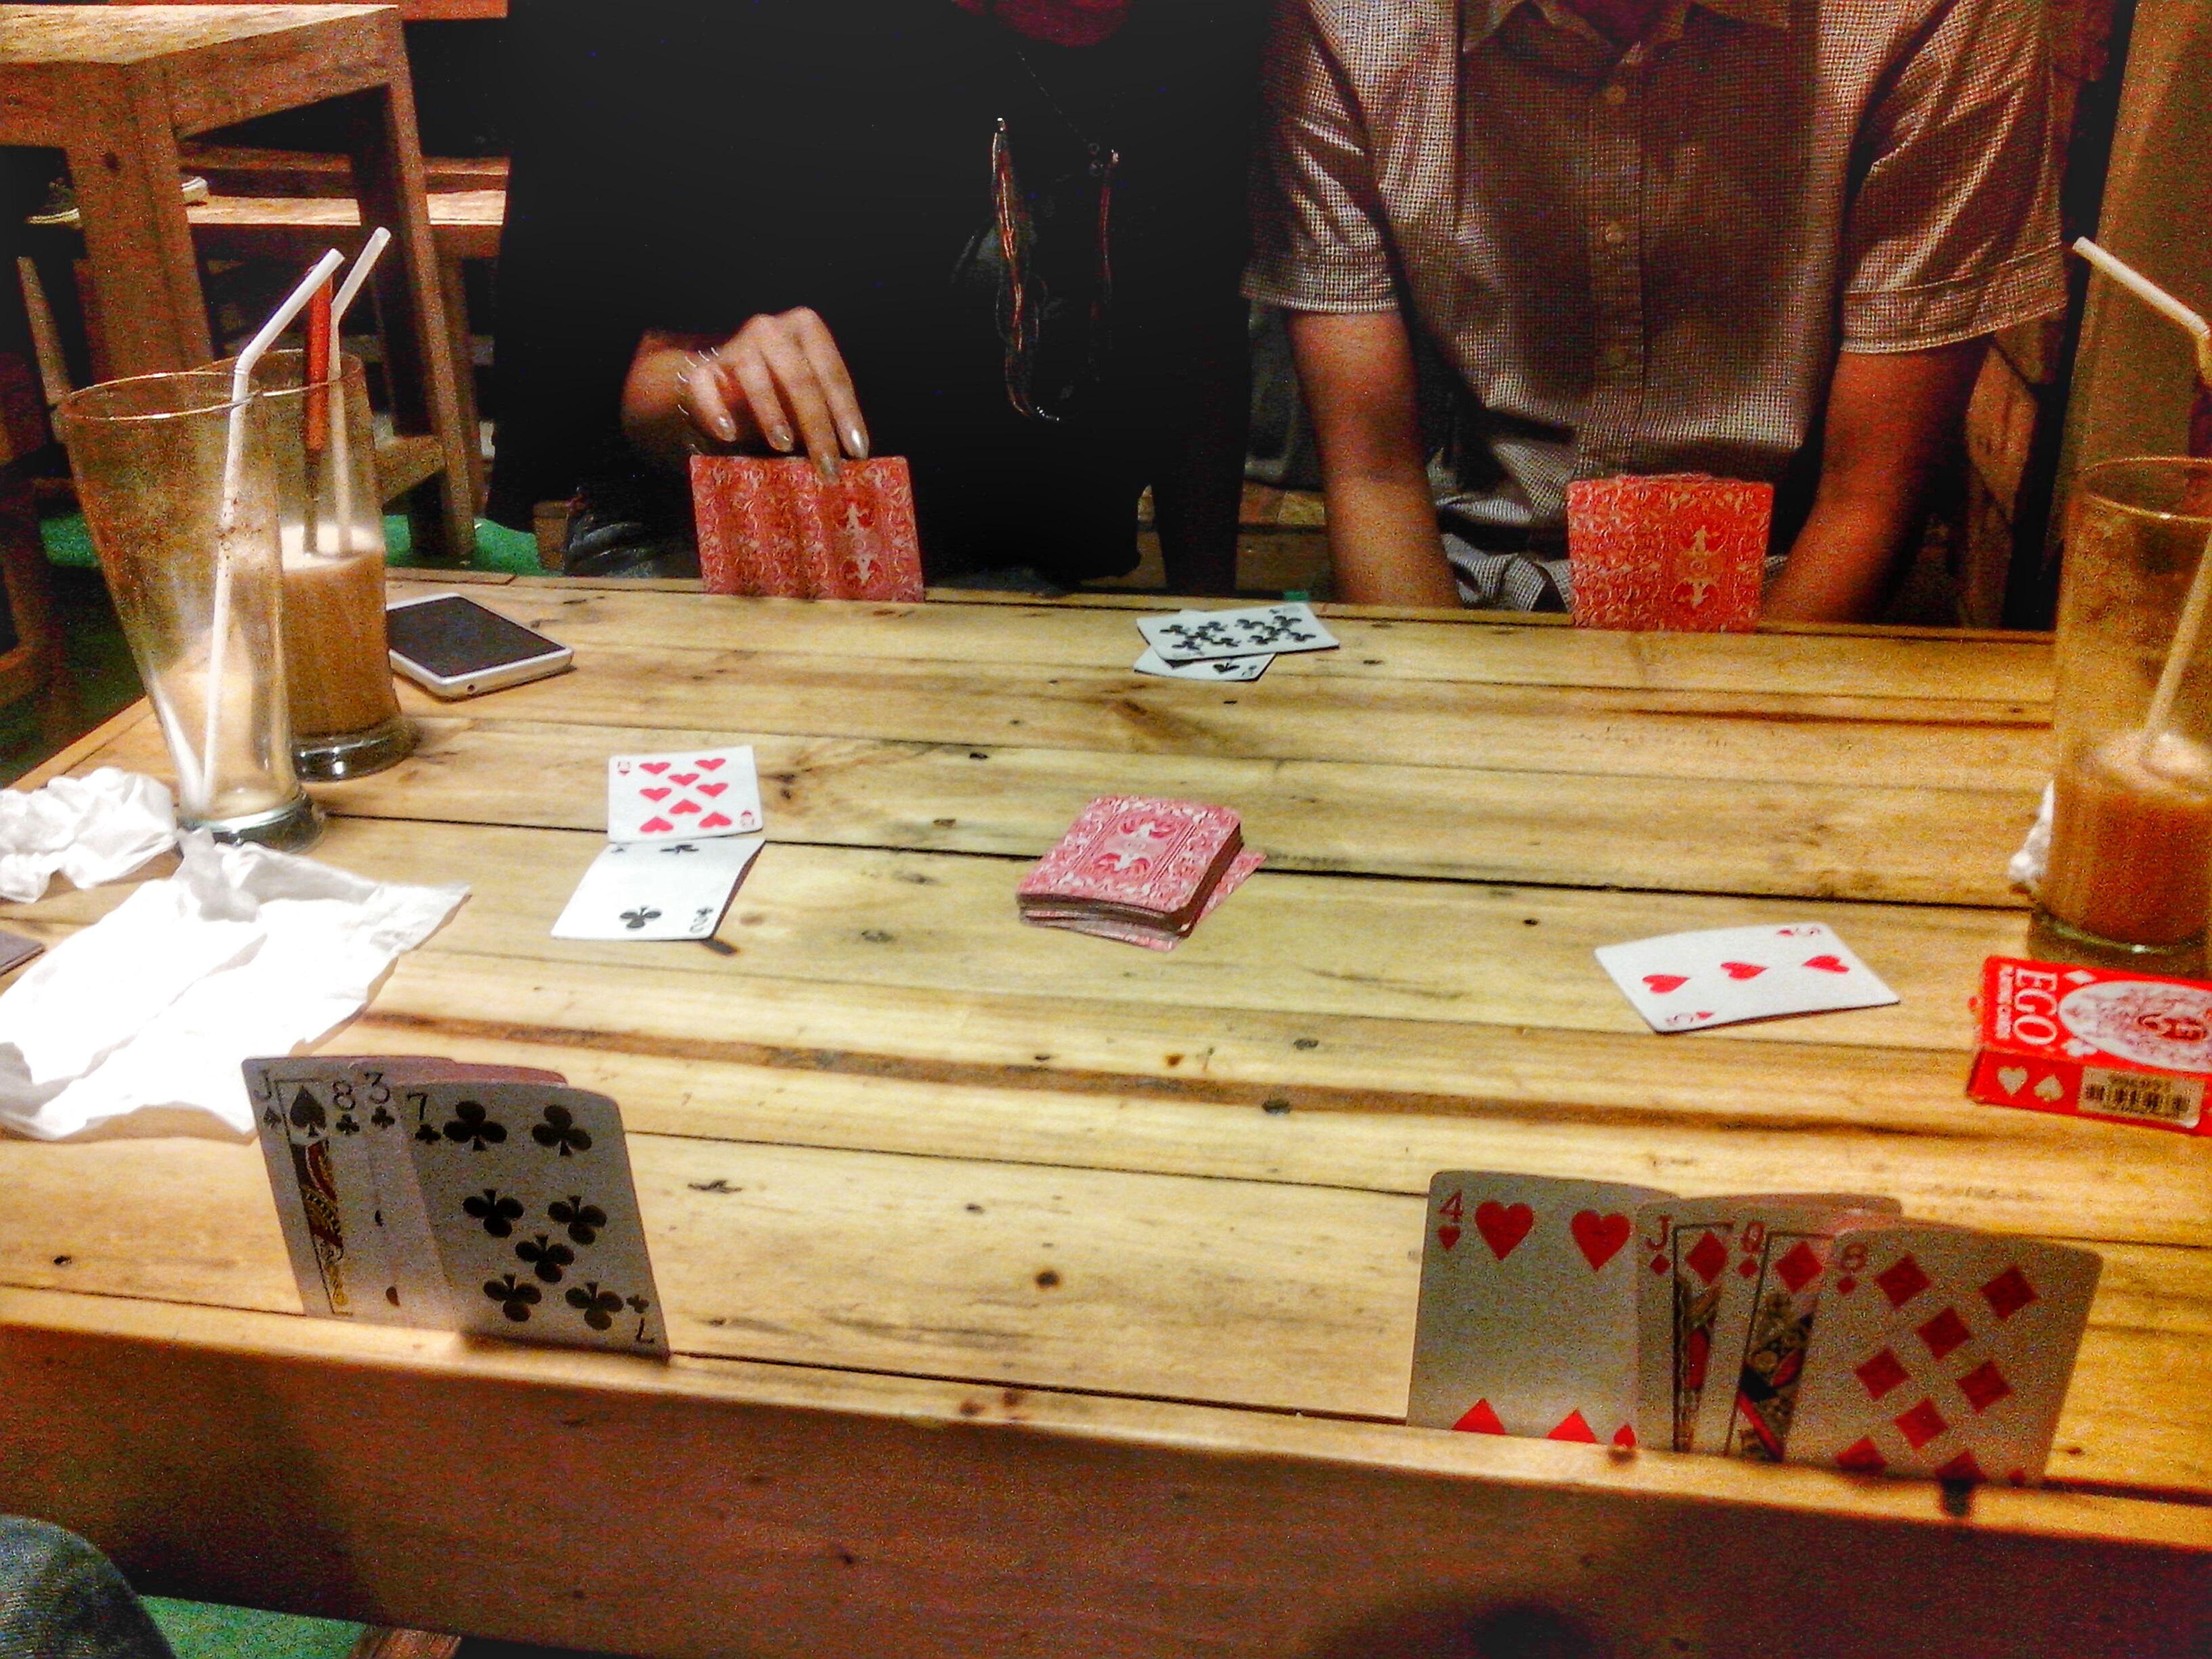 like Casino! Meeting Friends Playing Cards Casino